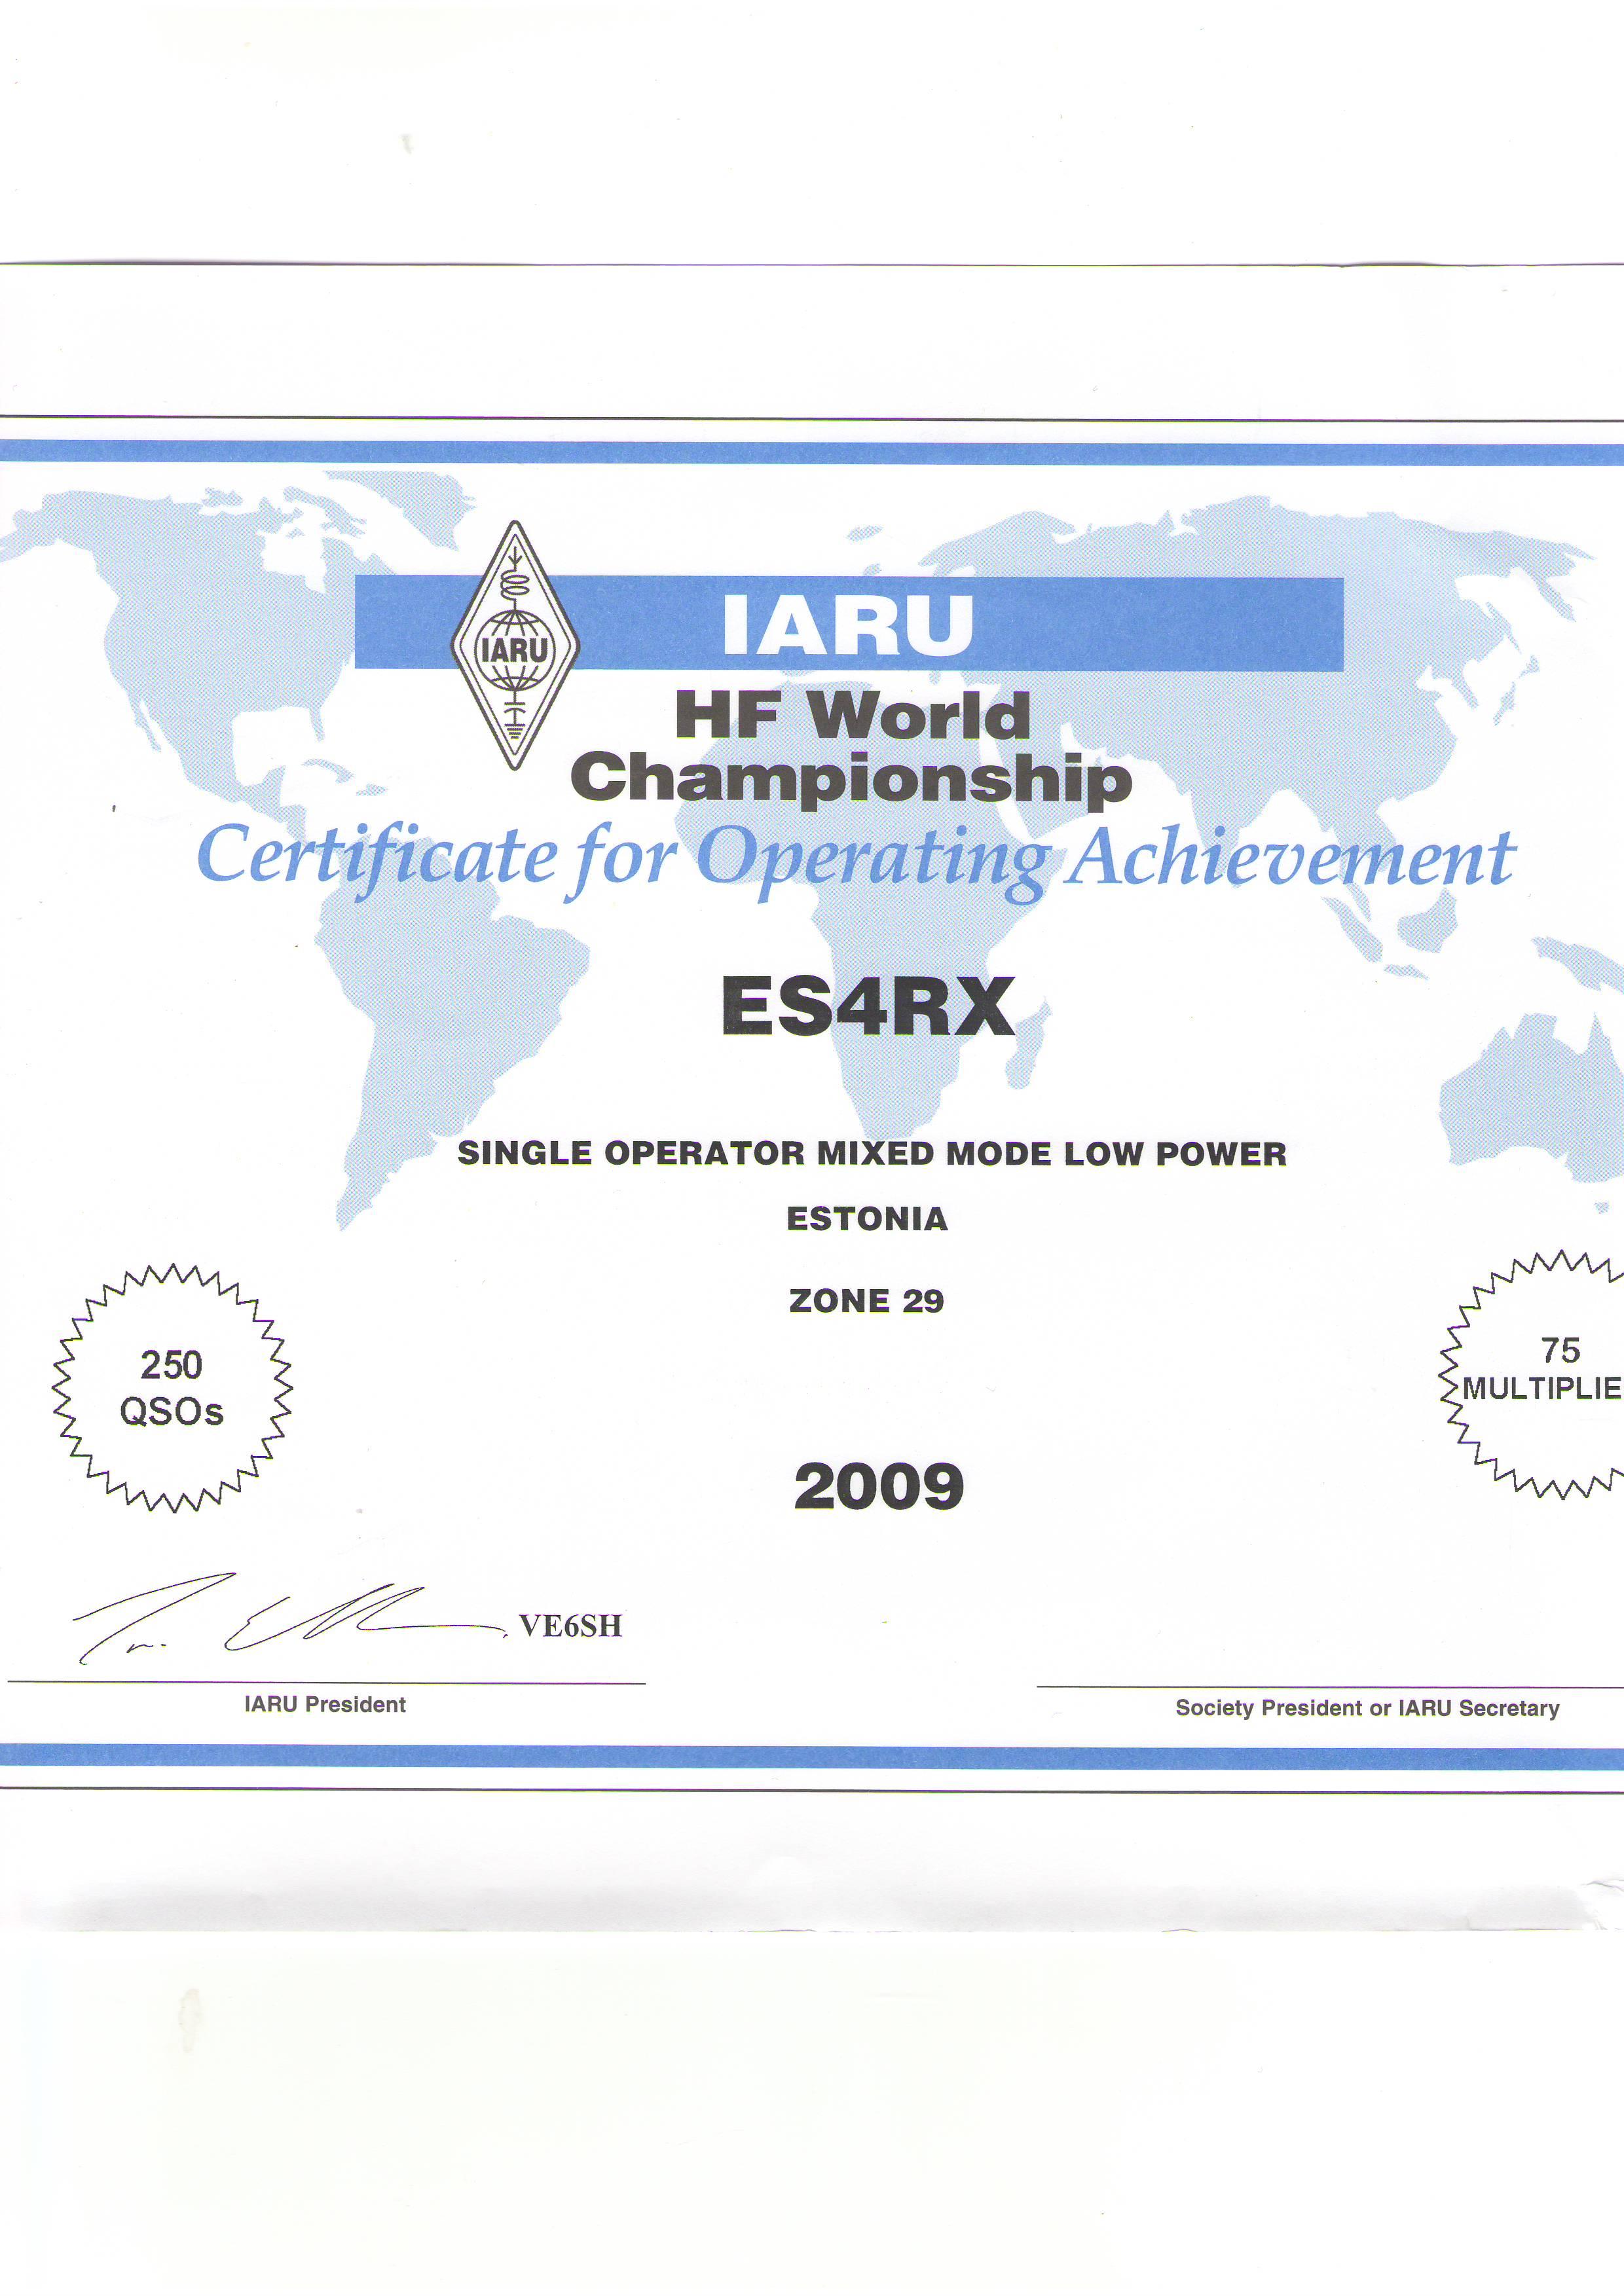 Нажмите на изображение для увеличения.  Название:IARU.JPG Просмотров:153 Размер:598.0 Кб ID:40782